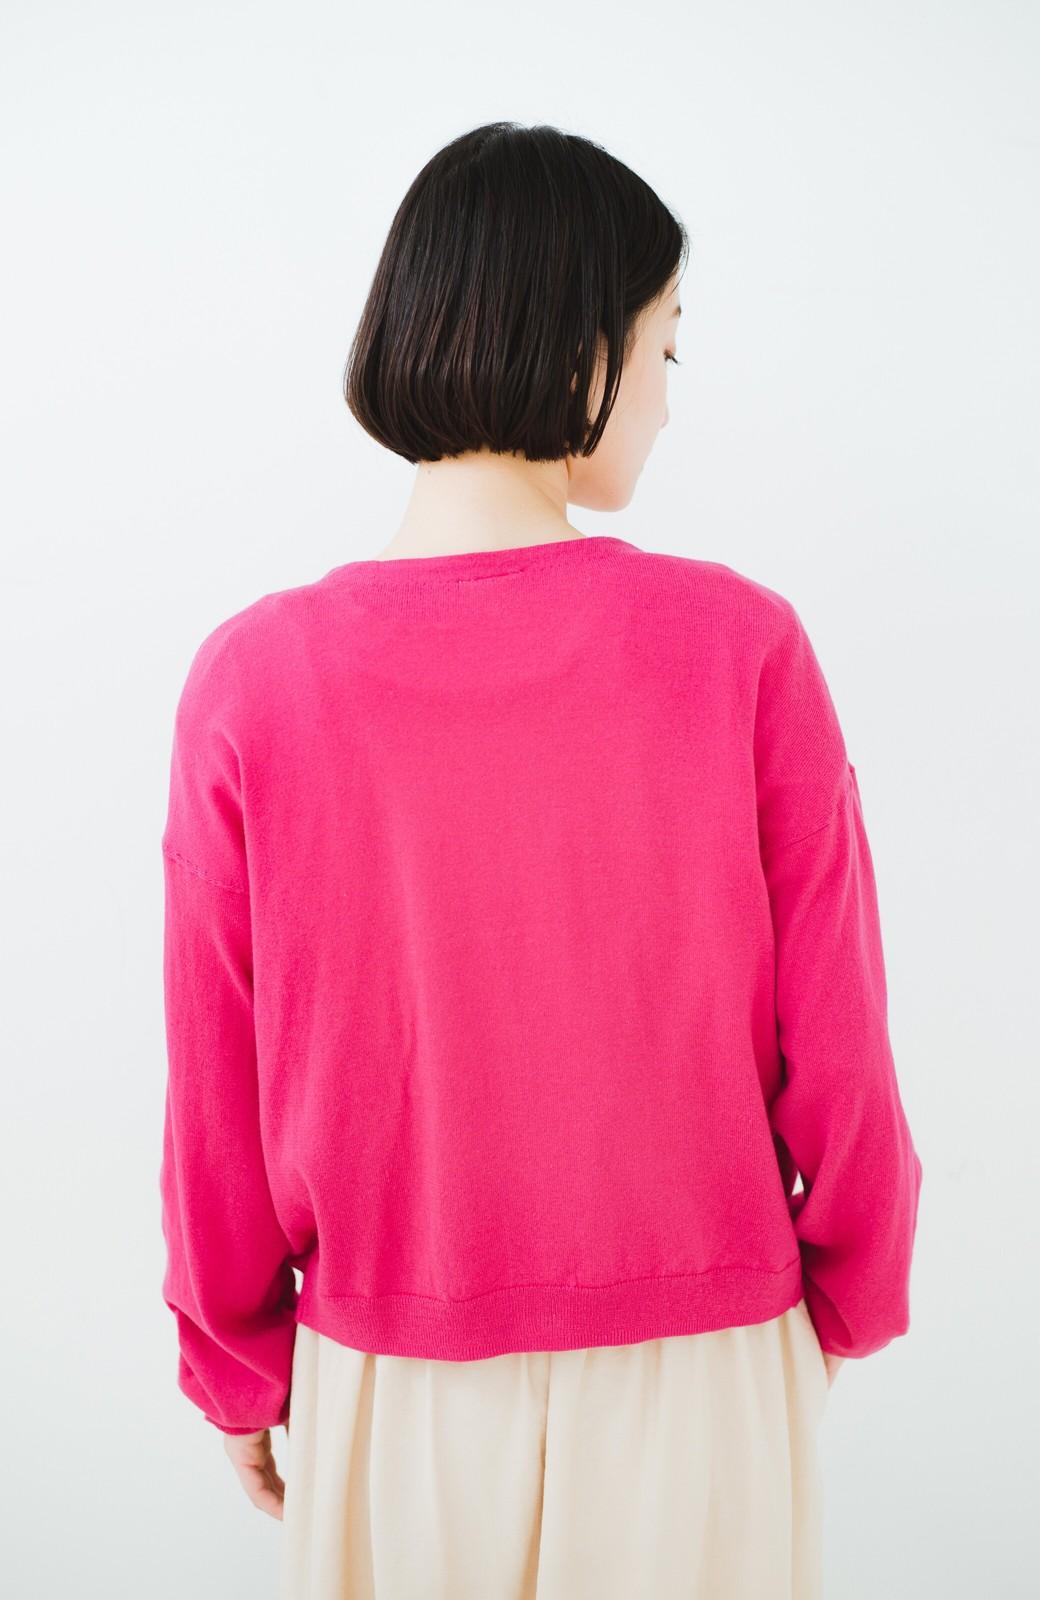 haco! 我らが天敵紫外線!UVカット加工の袖シャーリングニットカーディガン <ピンク>の商品写真16